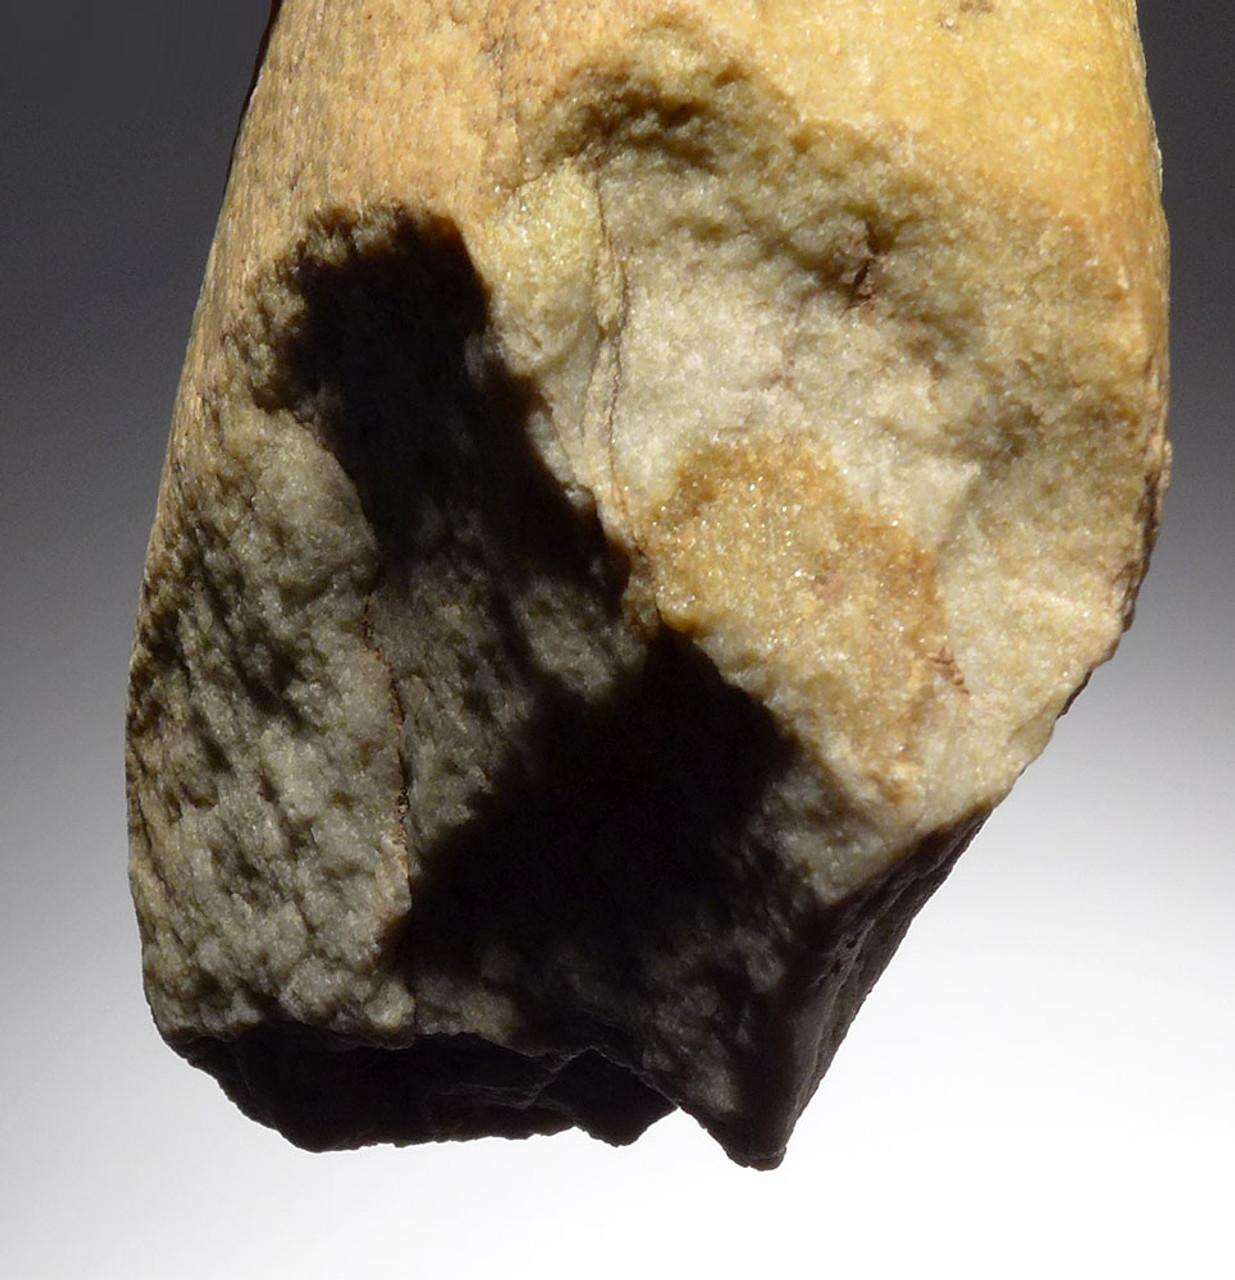 CLASSIC HOMO ERECTUS OLDOWAN PEBBLE CHOPPER AXE FROM REGION OF EARLIEST HUMANS IN EUROPE  *PB150